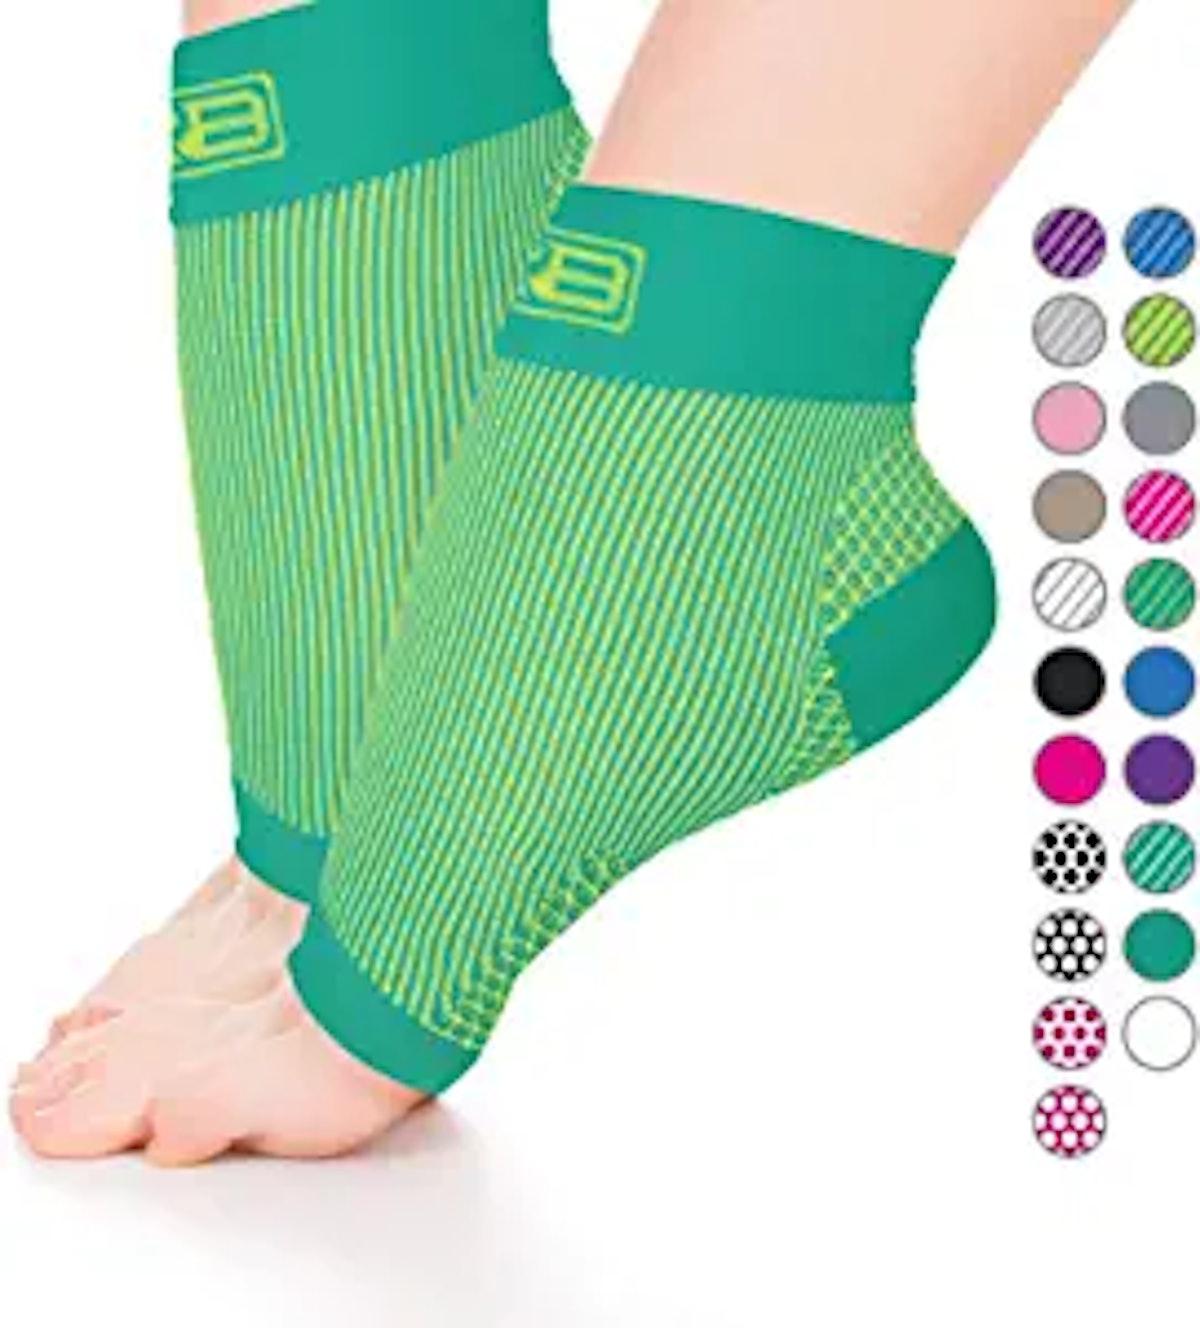 Go2 Ankle Brace Compression Socks